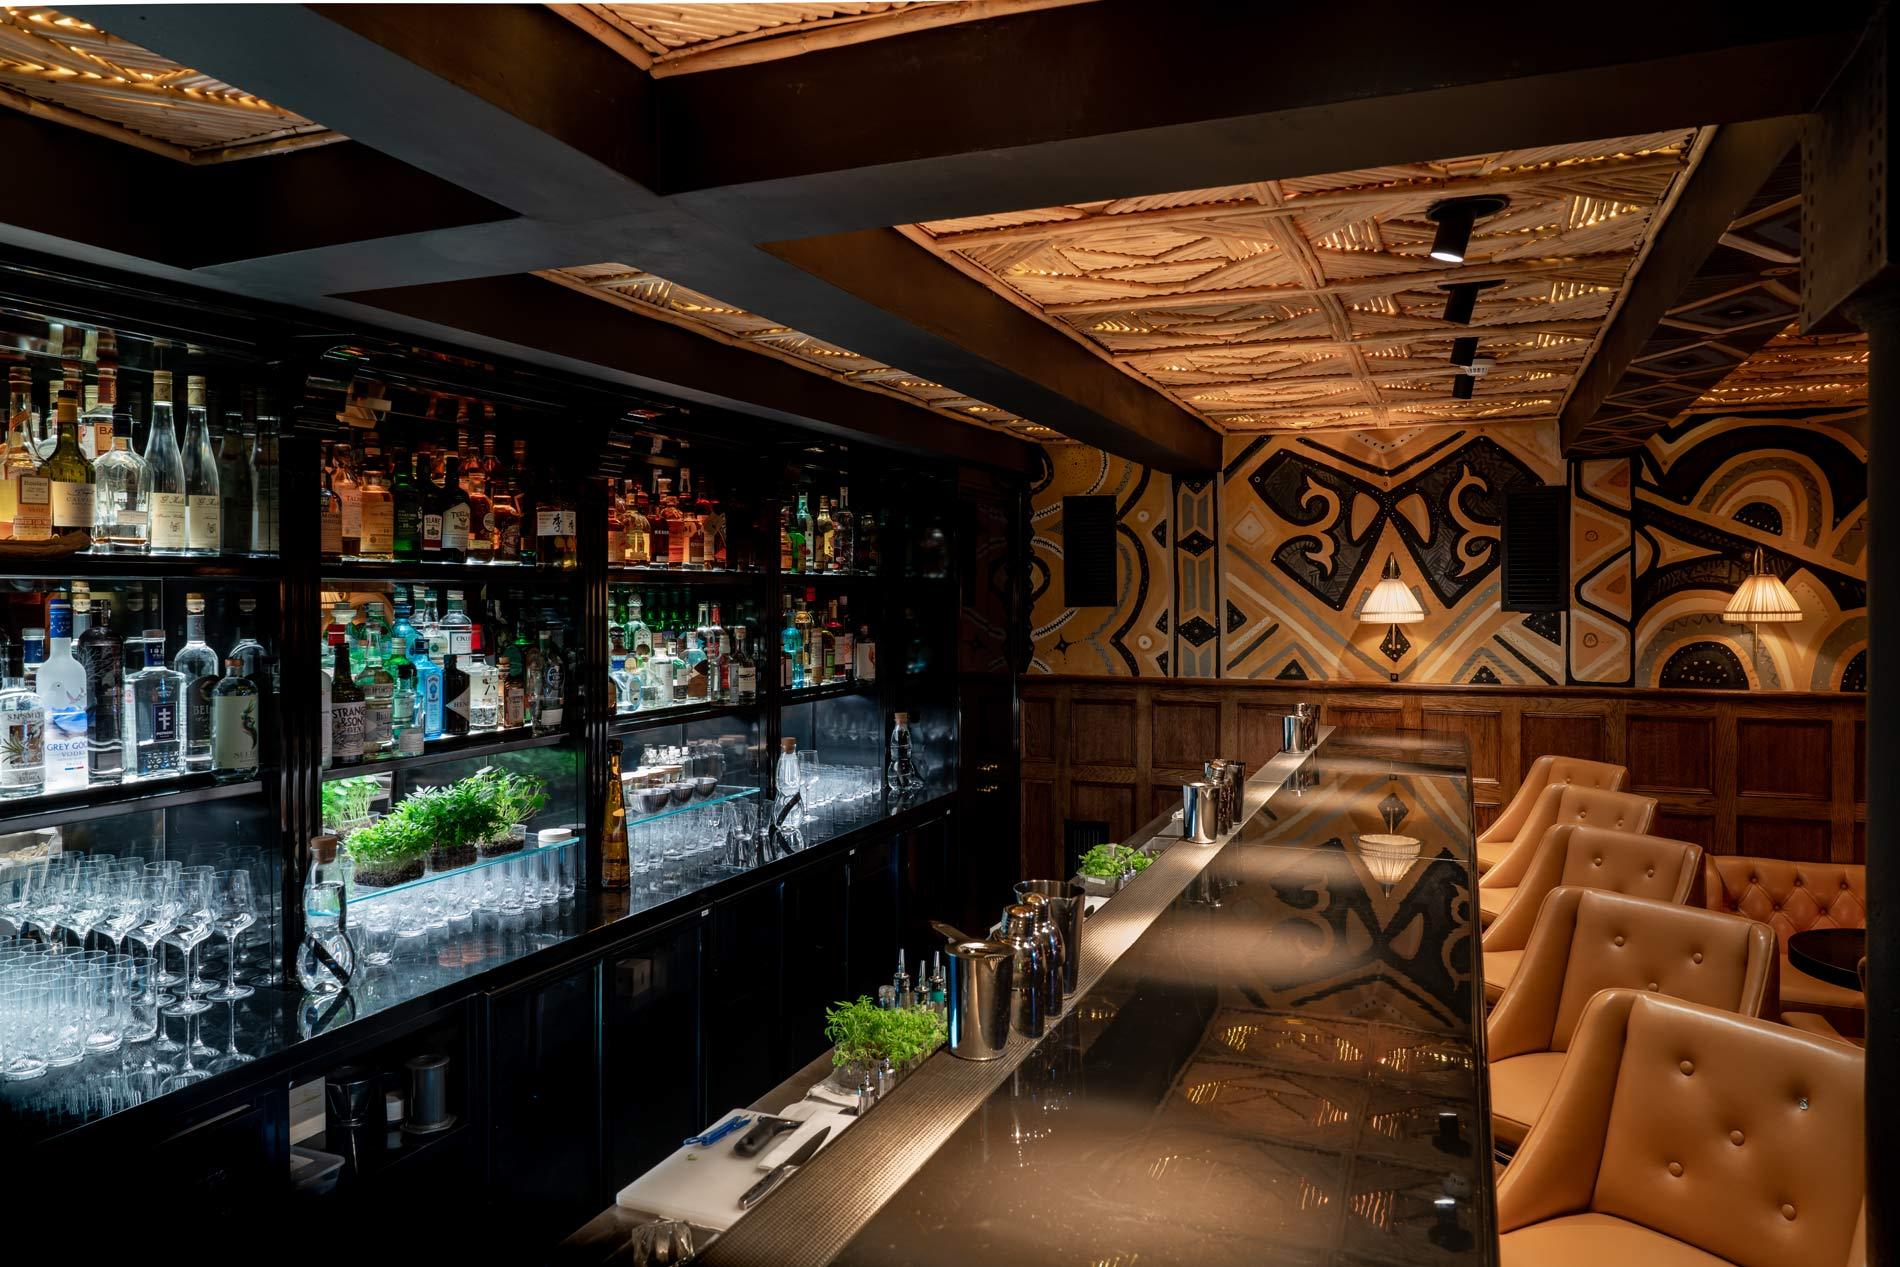 Kwant Bar London | Mixology Barguide